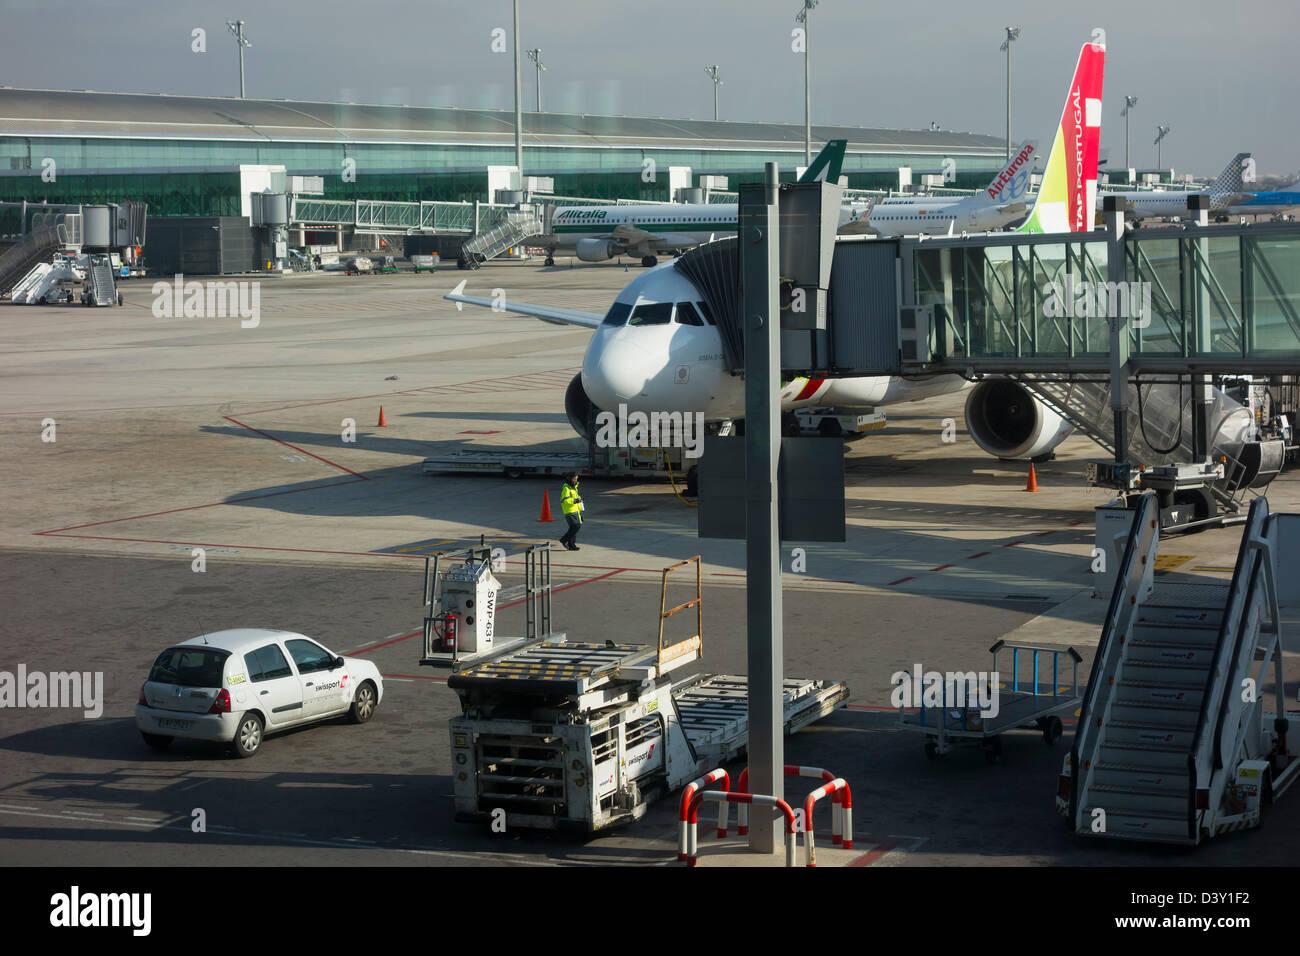 TAP airplane at the Barcelona El Prat Airport runway in Barcelona, Spain, Europe - Stock Image